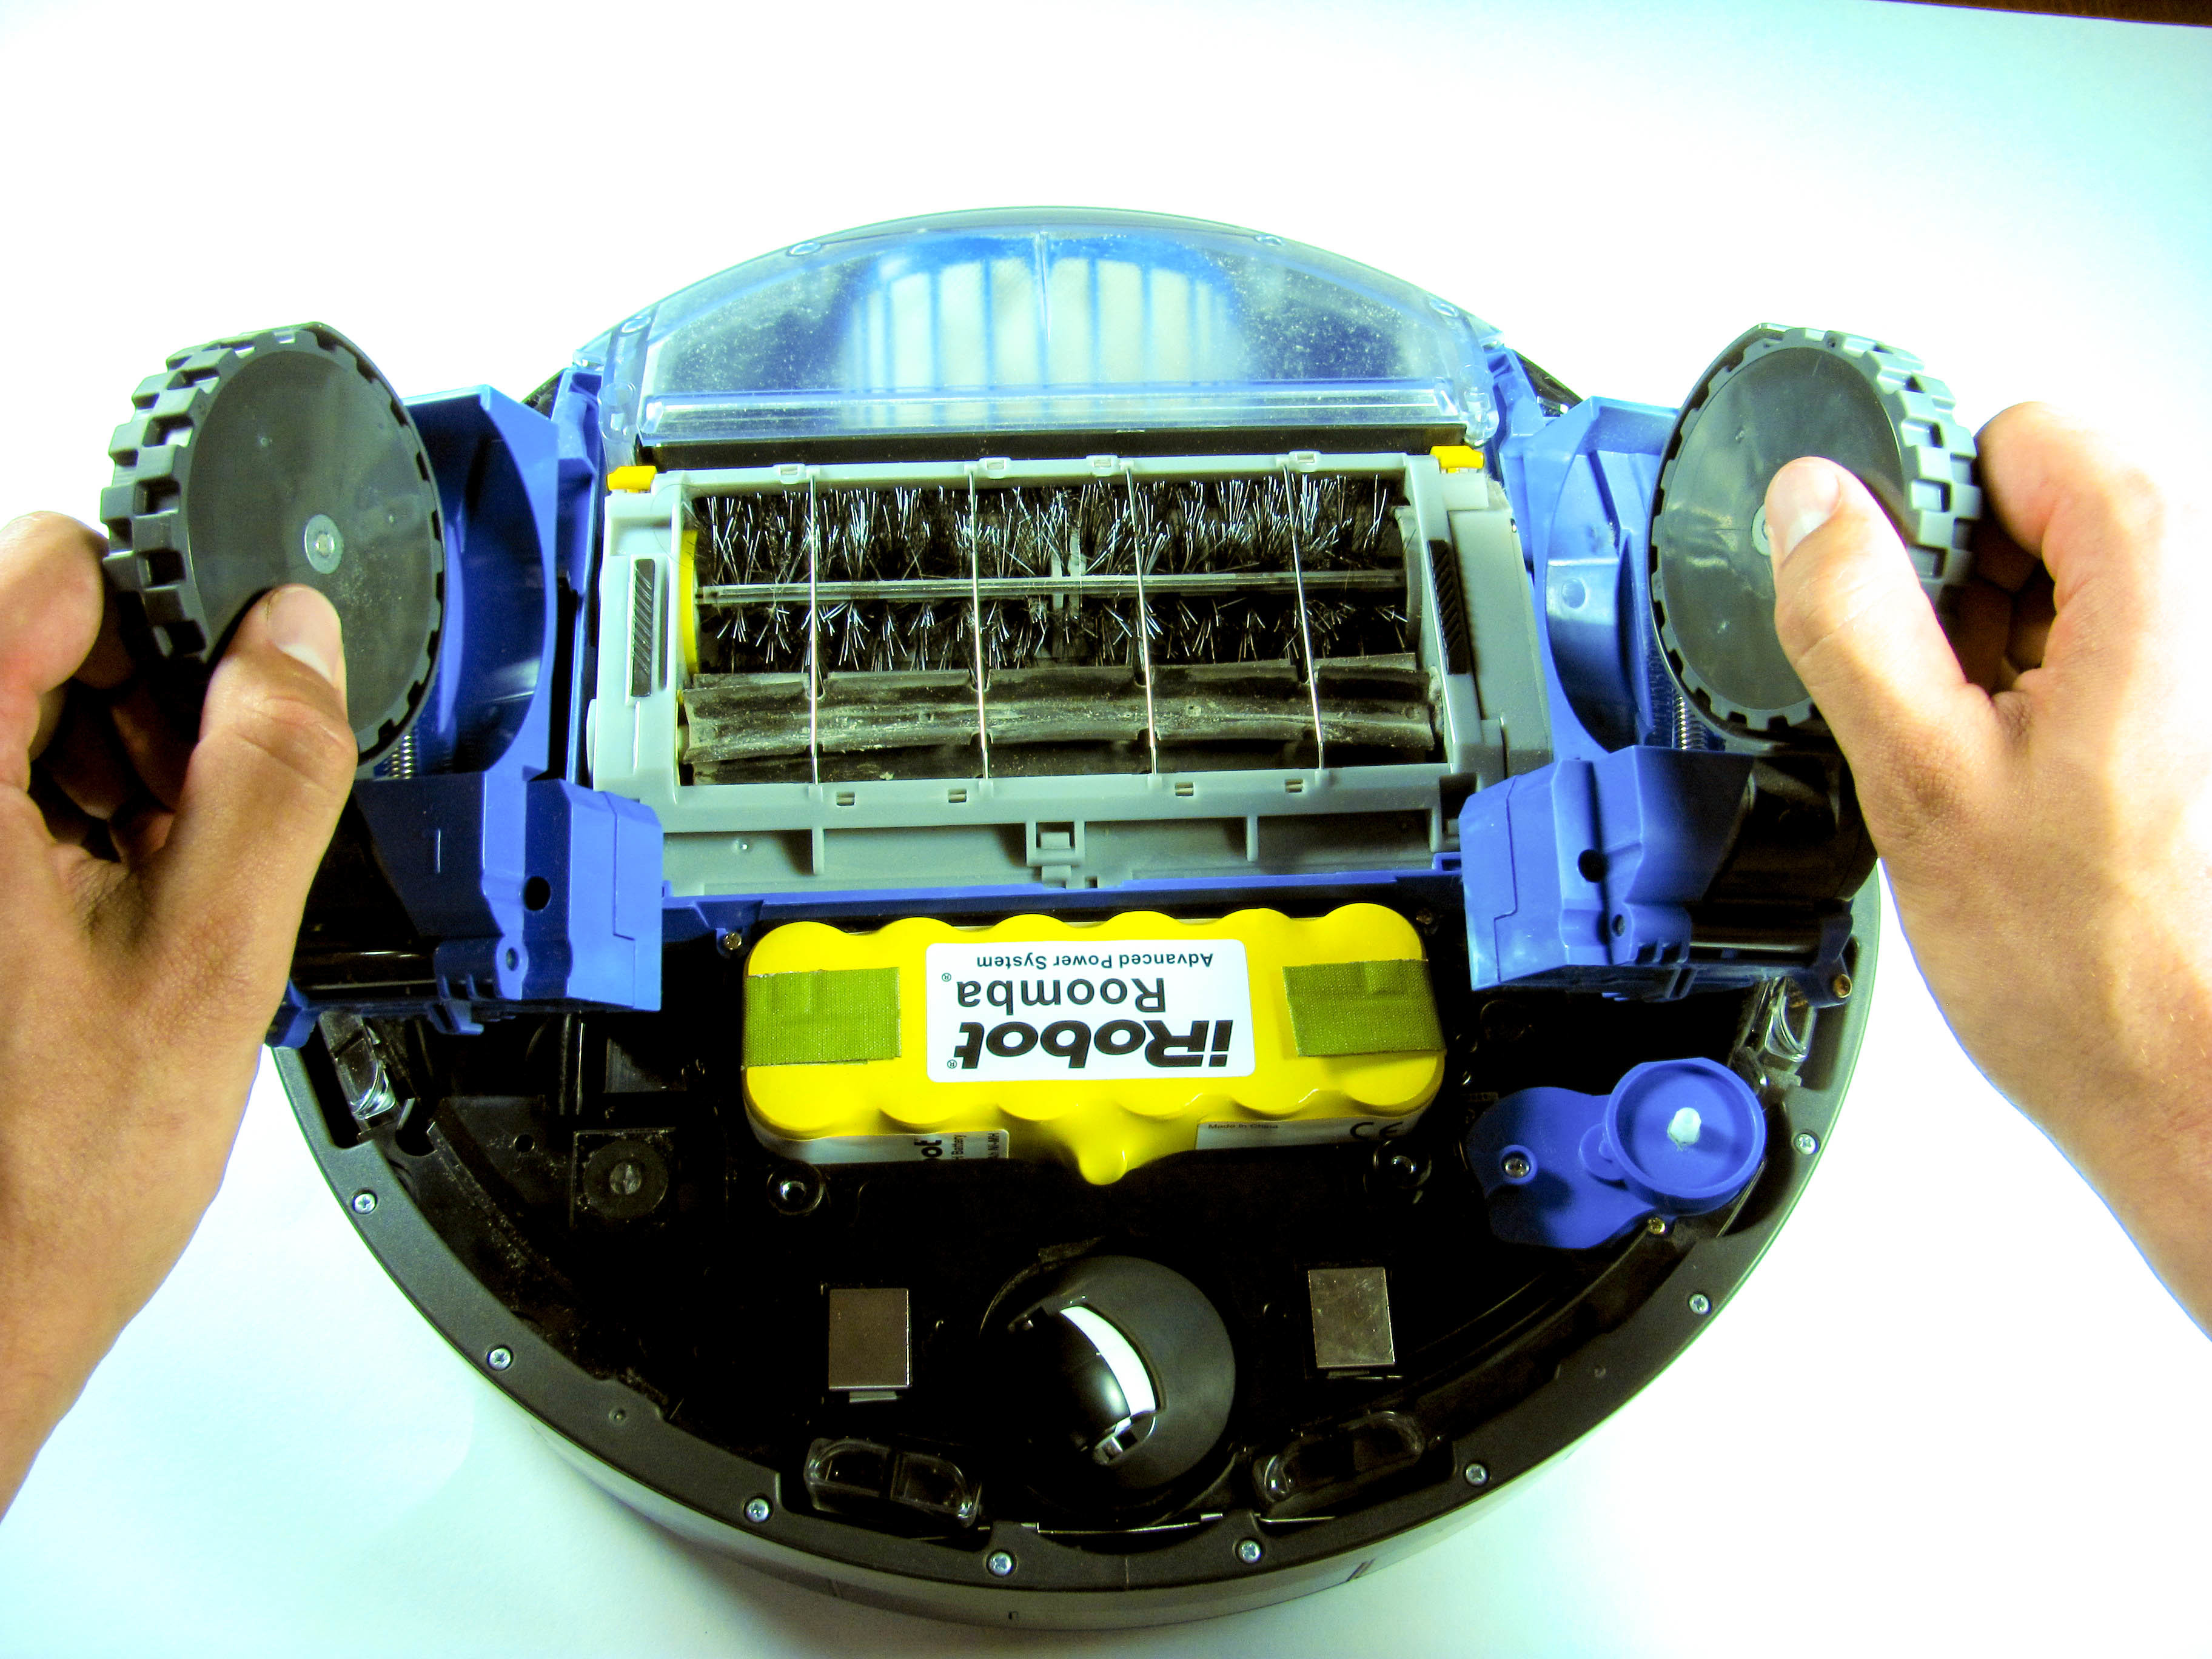 Irobot Roomba 650 Main Wheel Replacement Ifixit Repair Guide